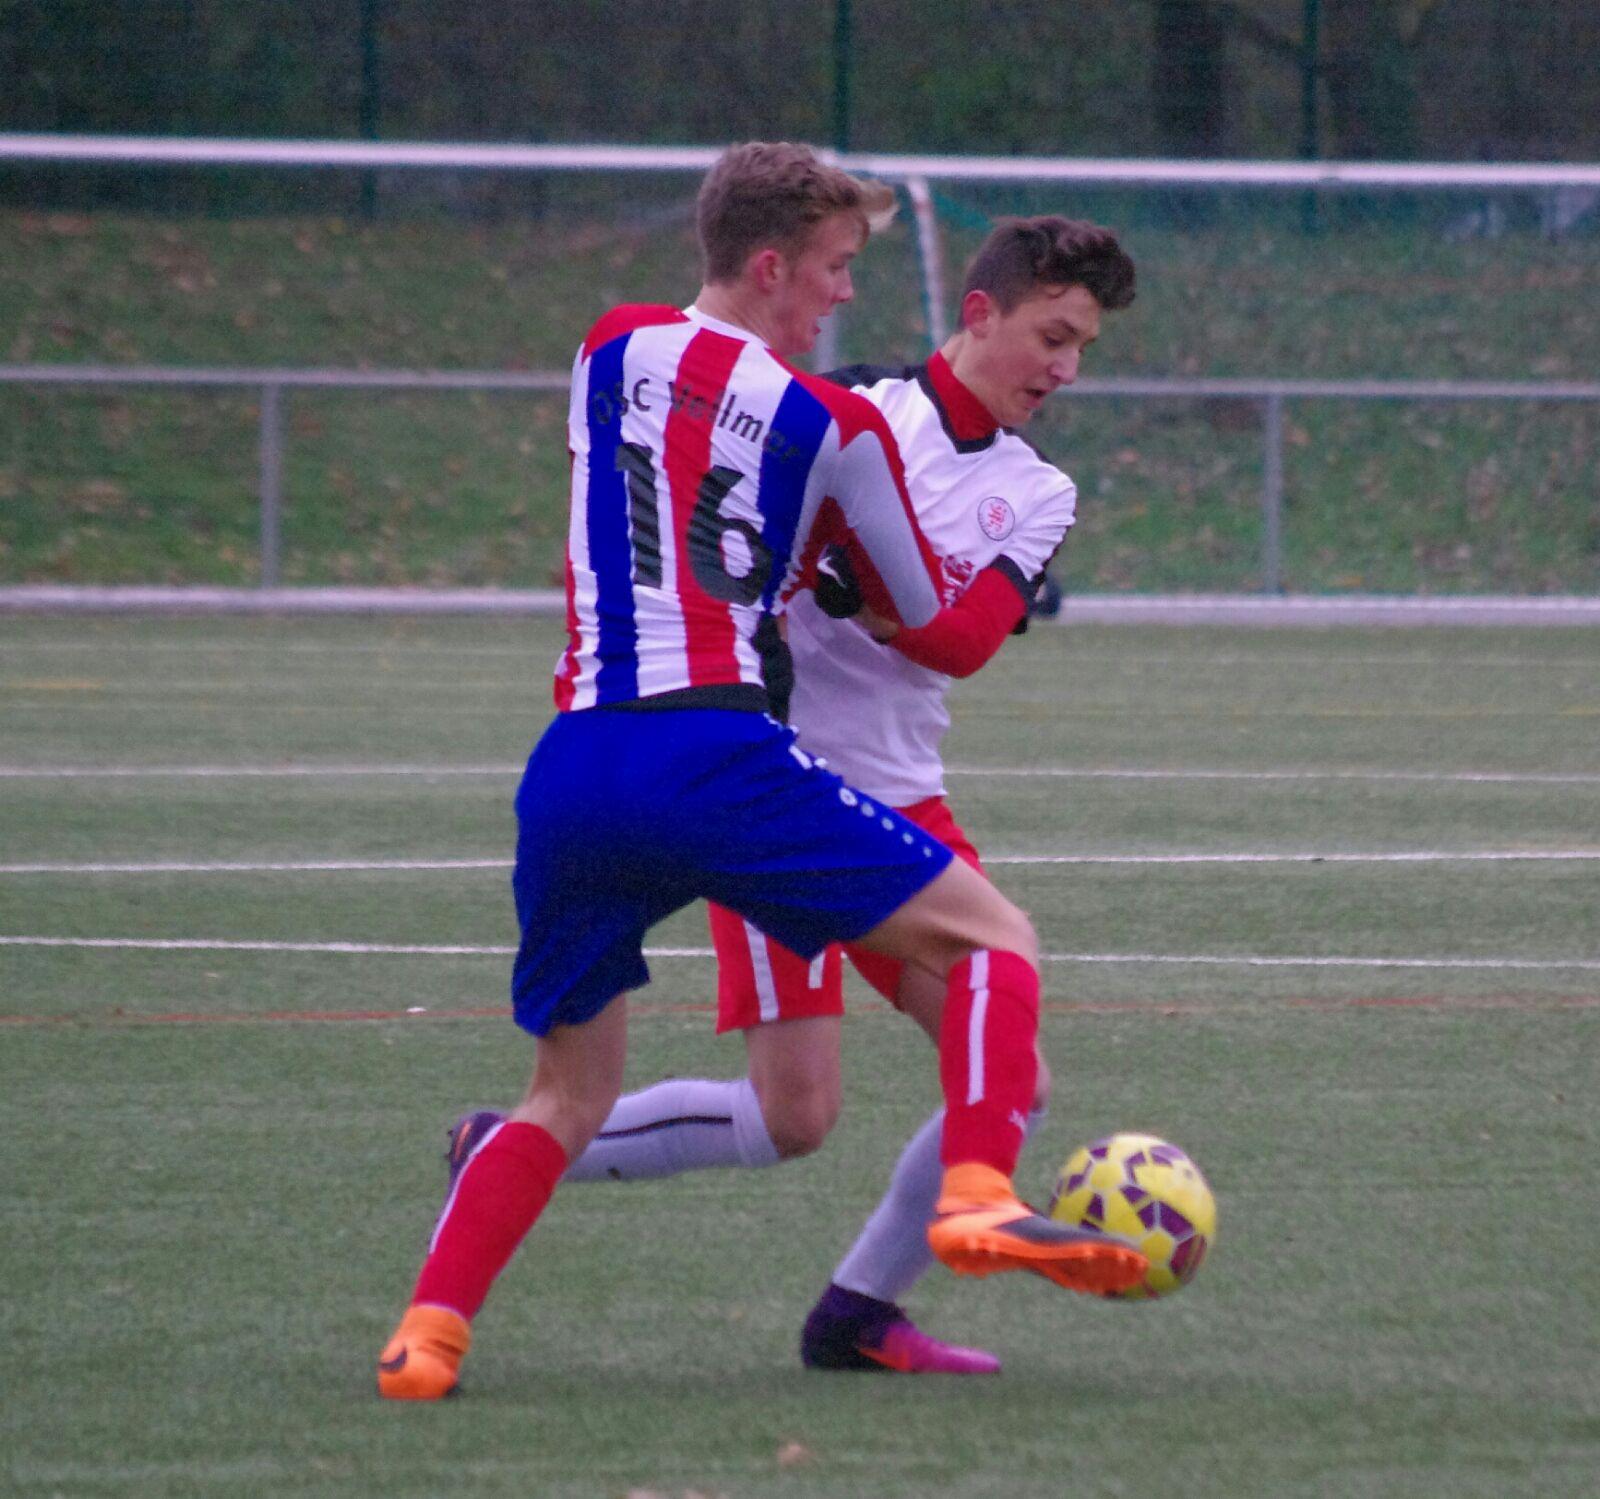 U16 - OSC Vellmar